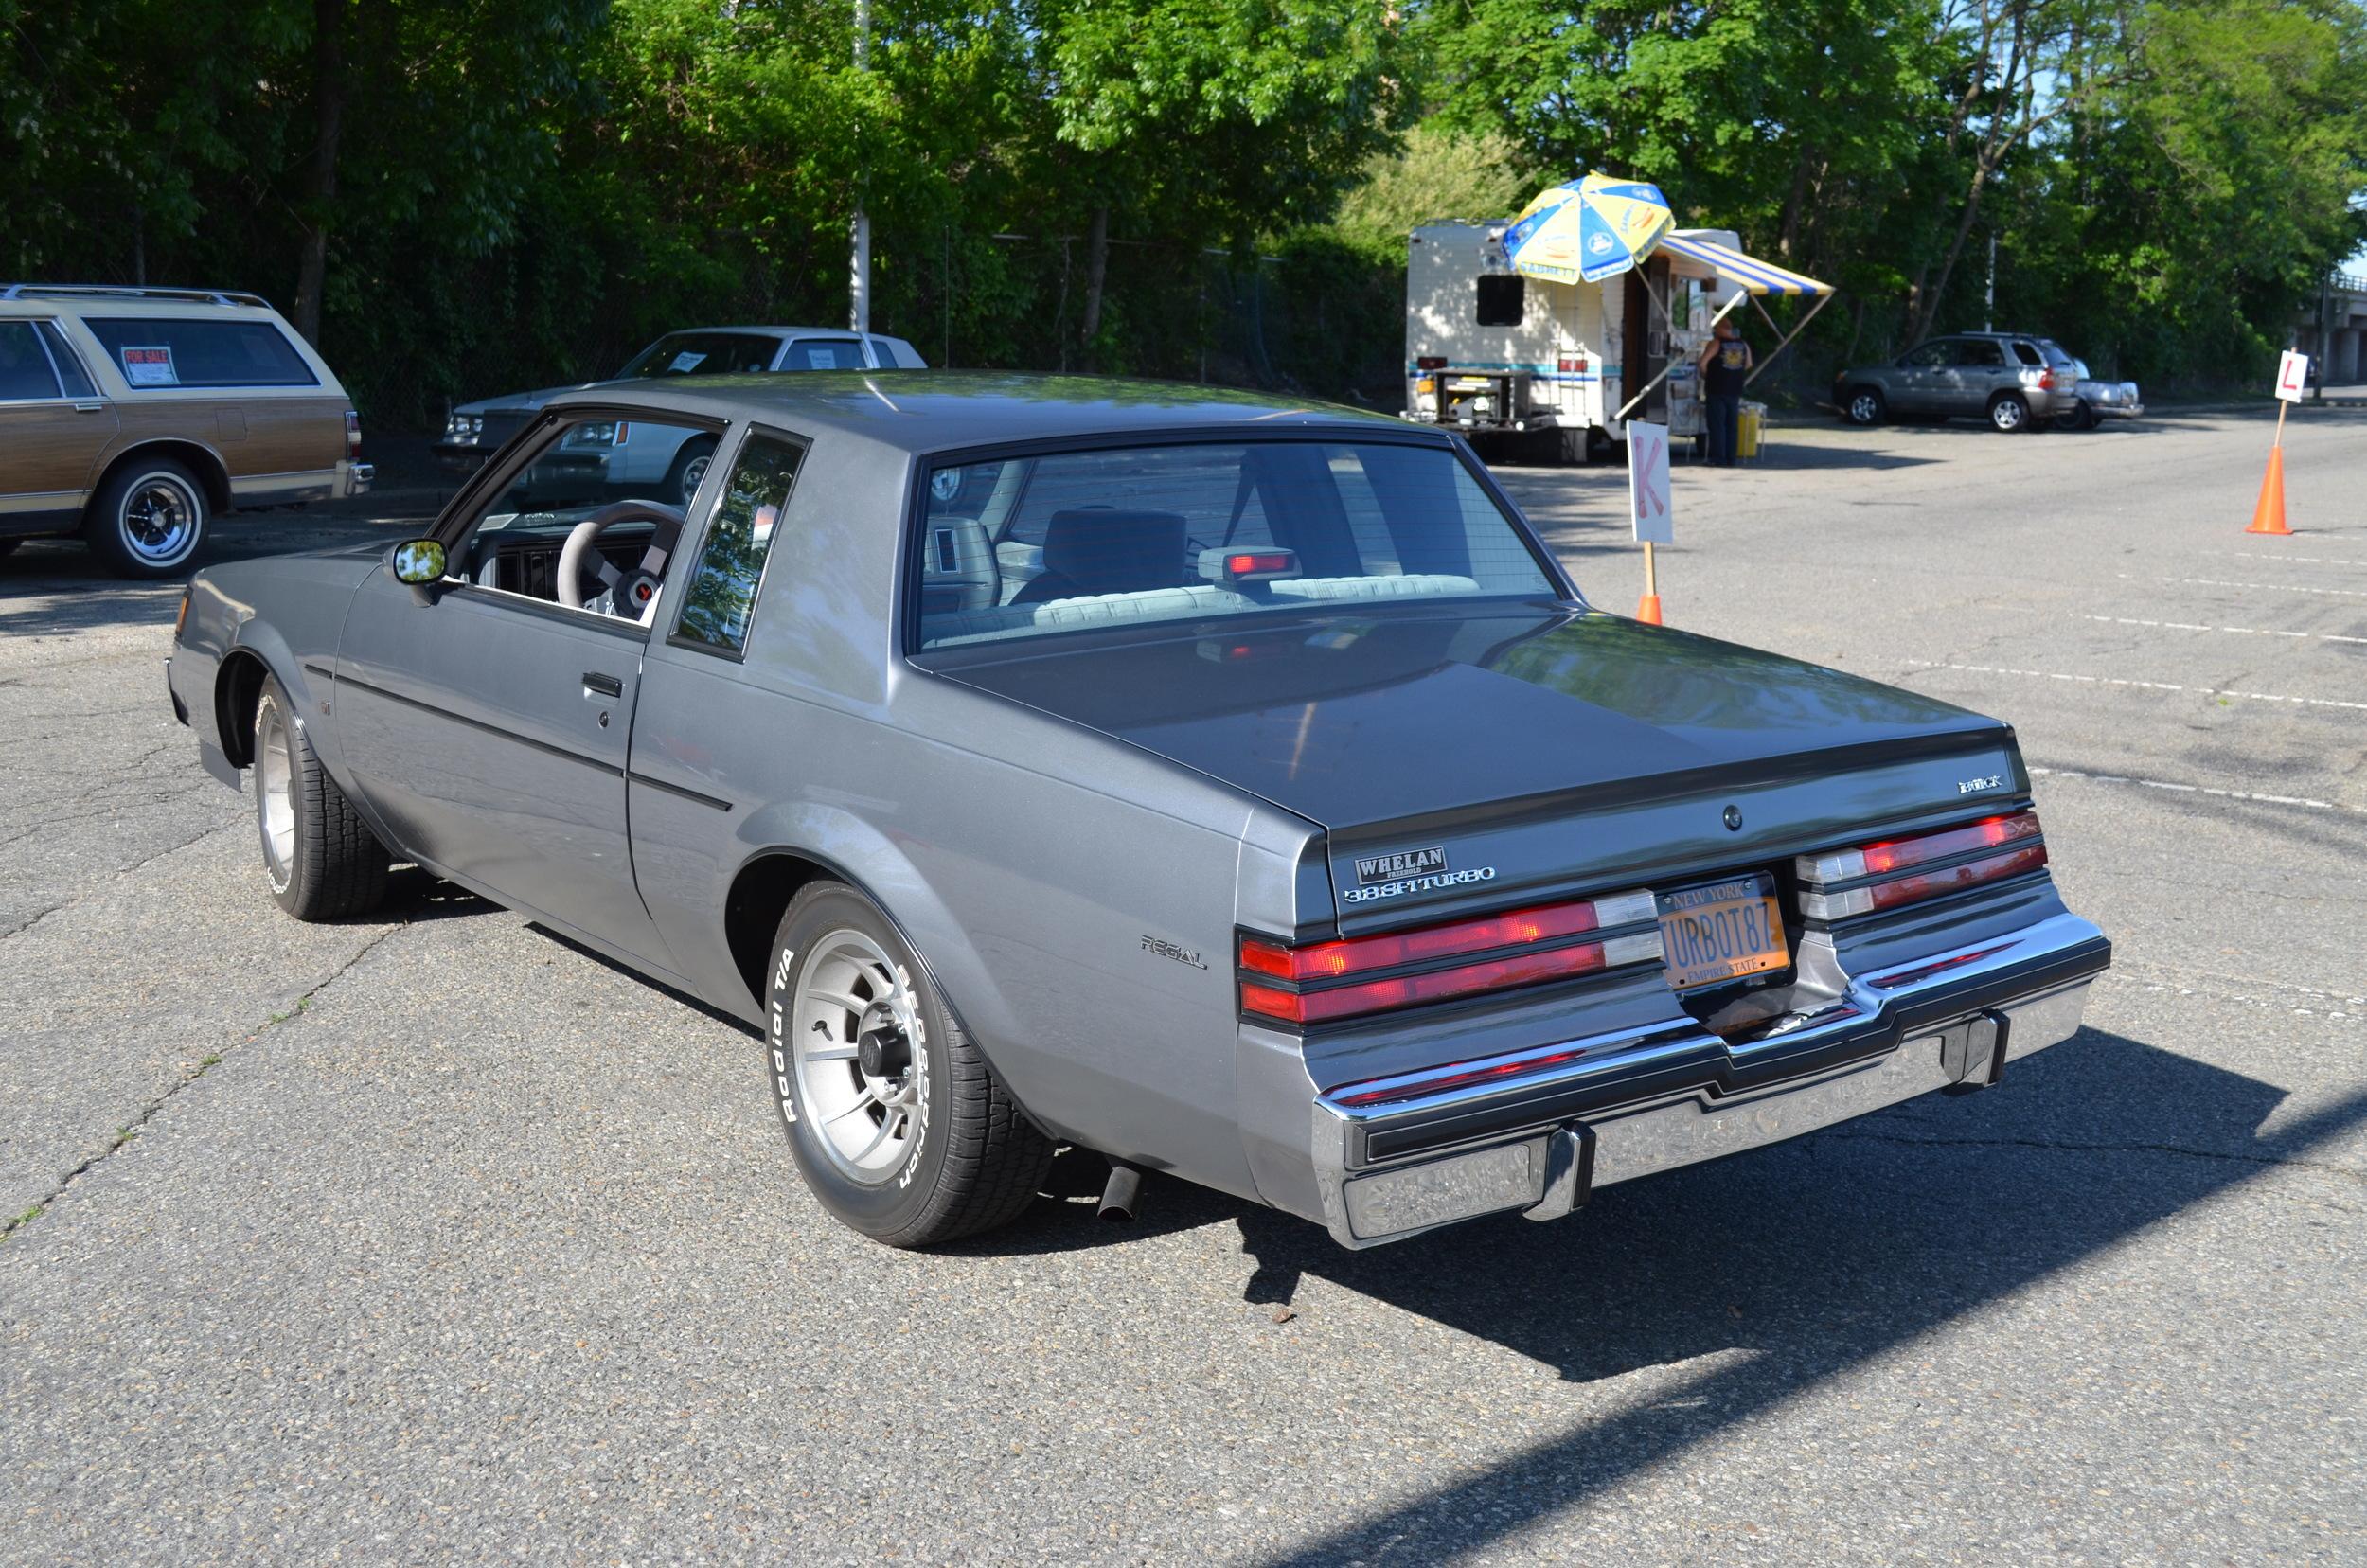 1987 Regal Turbo